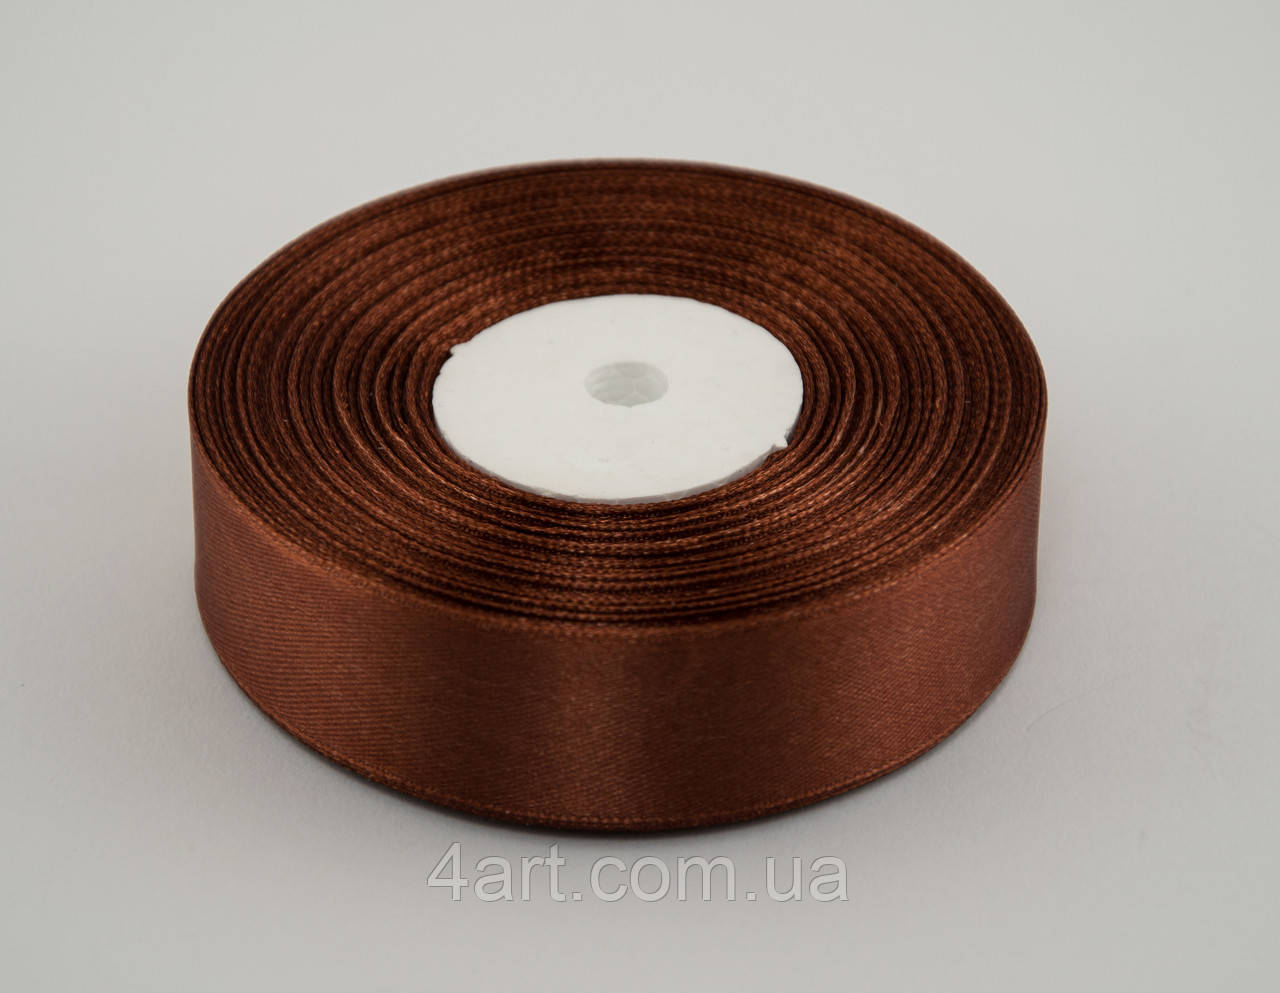 Лента атлас 0.6 см, 33 м, № 31 светло коричневая